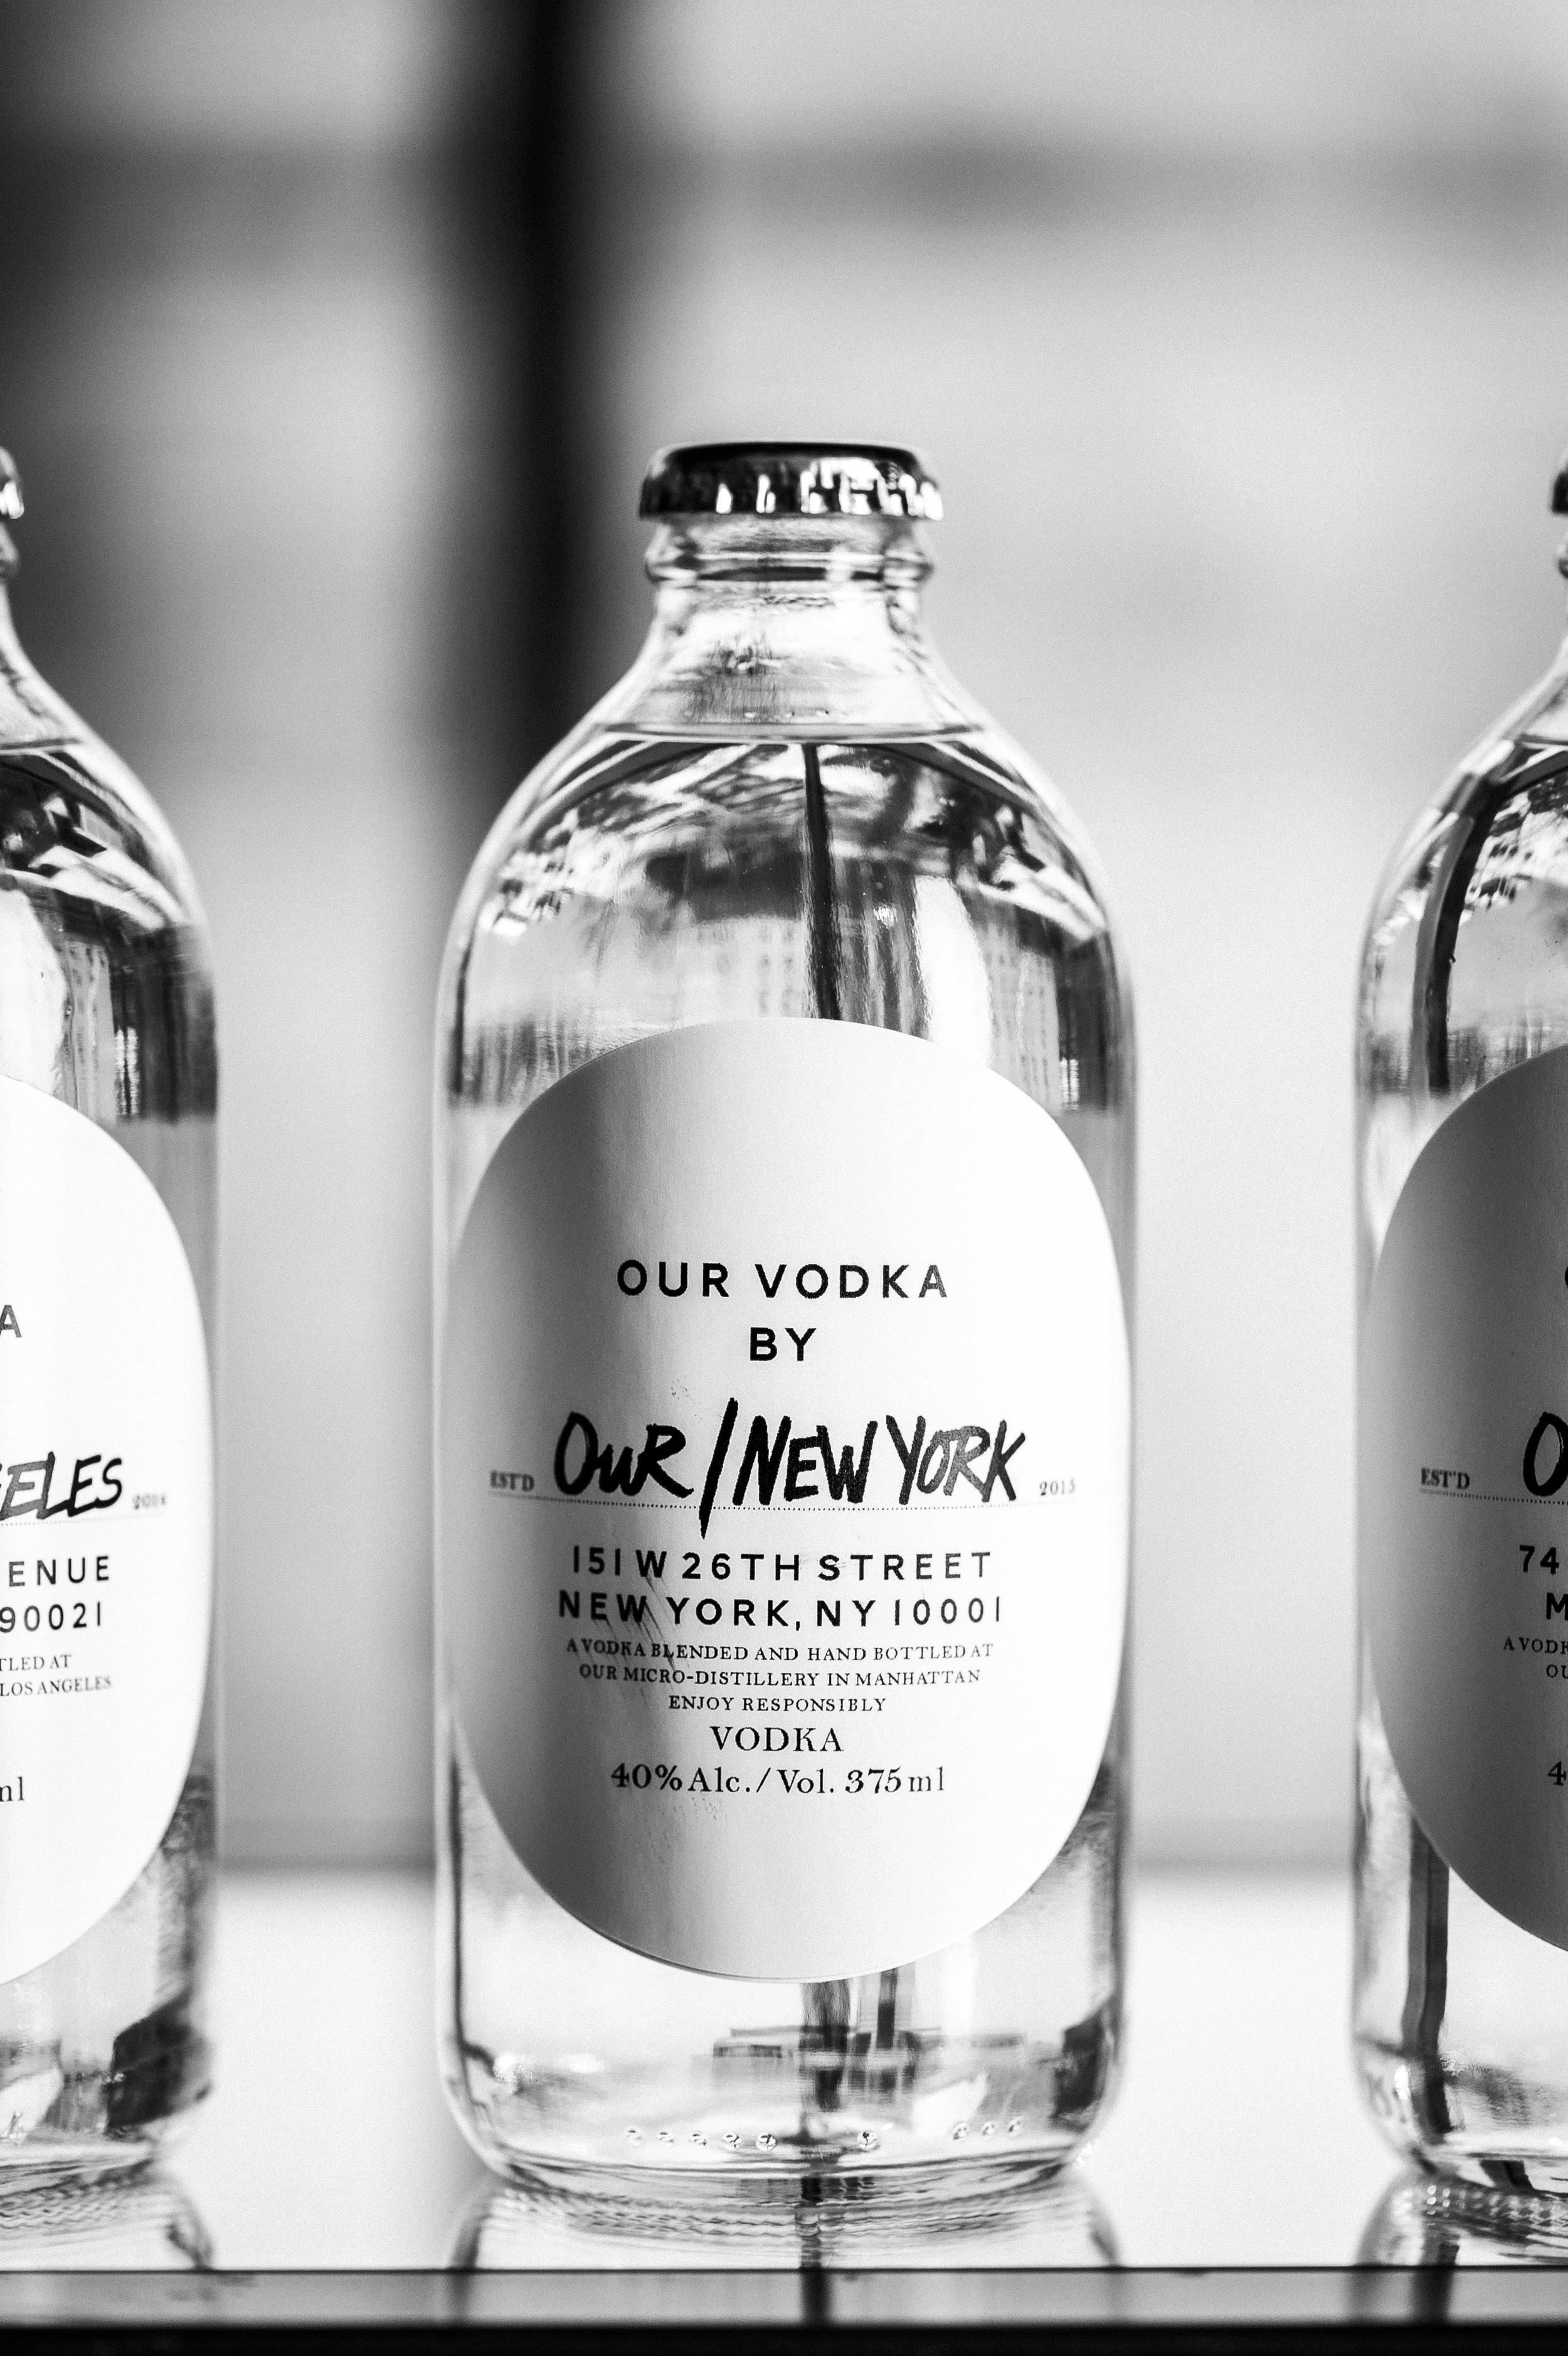 press-bottles-OurVodka180131_0000-46-min.jpg